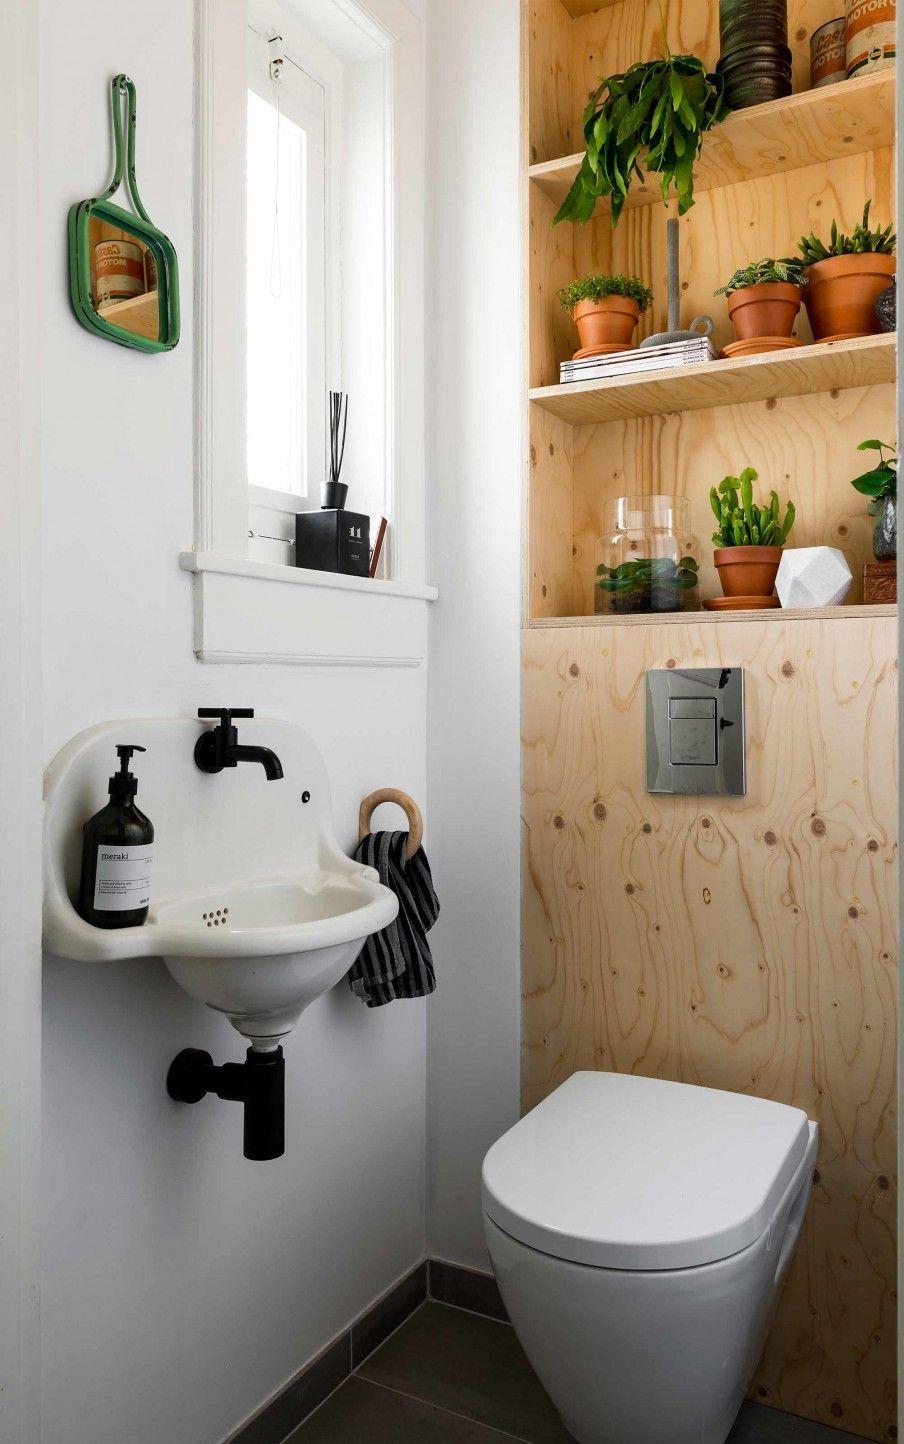 20 ways to add plants in the bathroom bathroom bathroom plants bathroom bathroom toilets. Black Bedroom Furniture Sets. Home Design Ideas